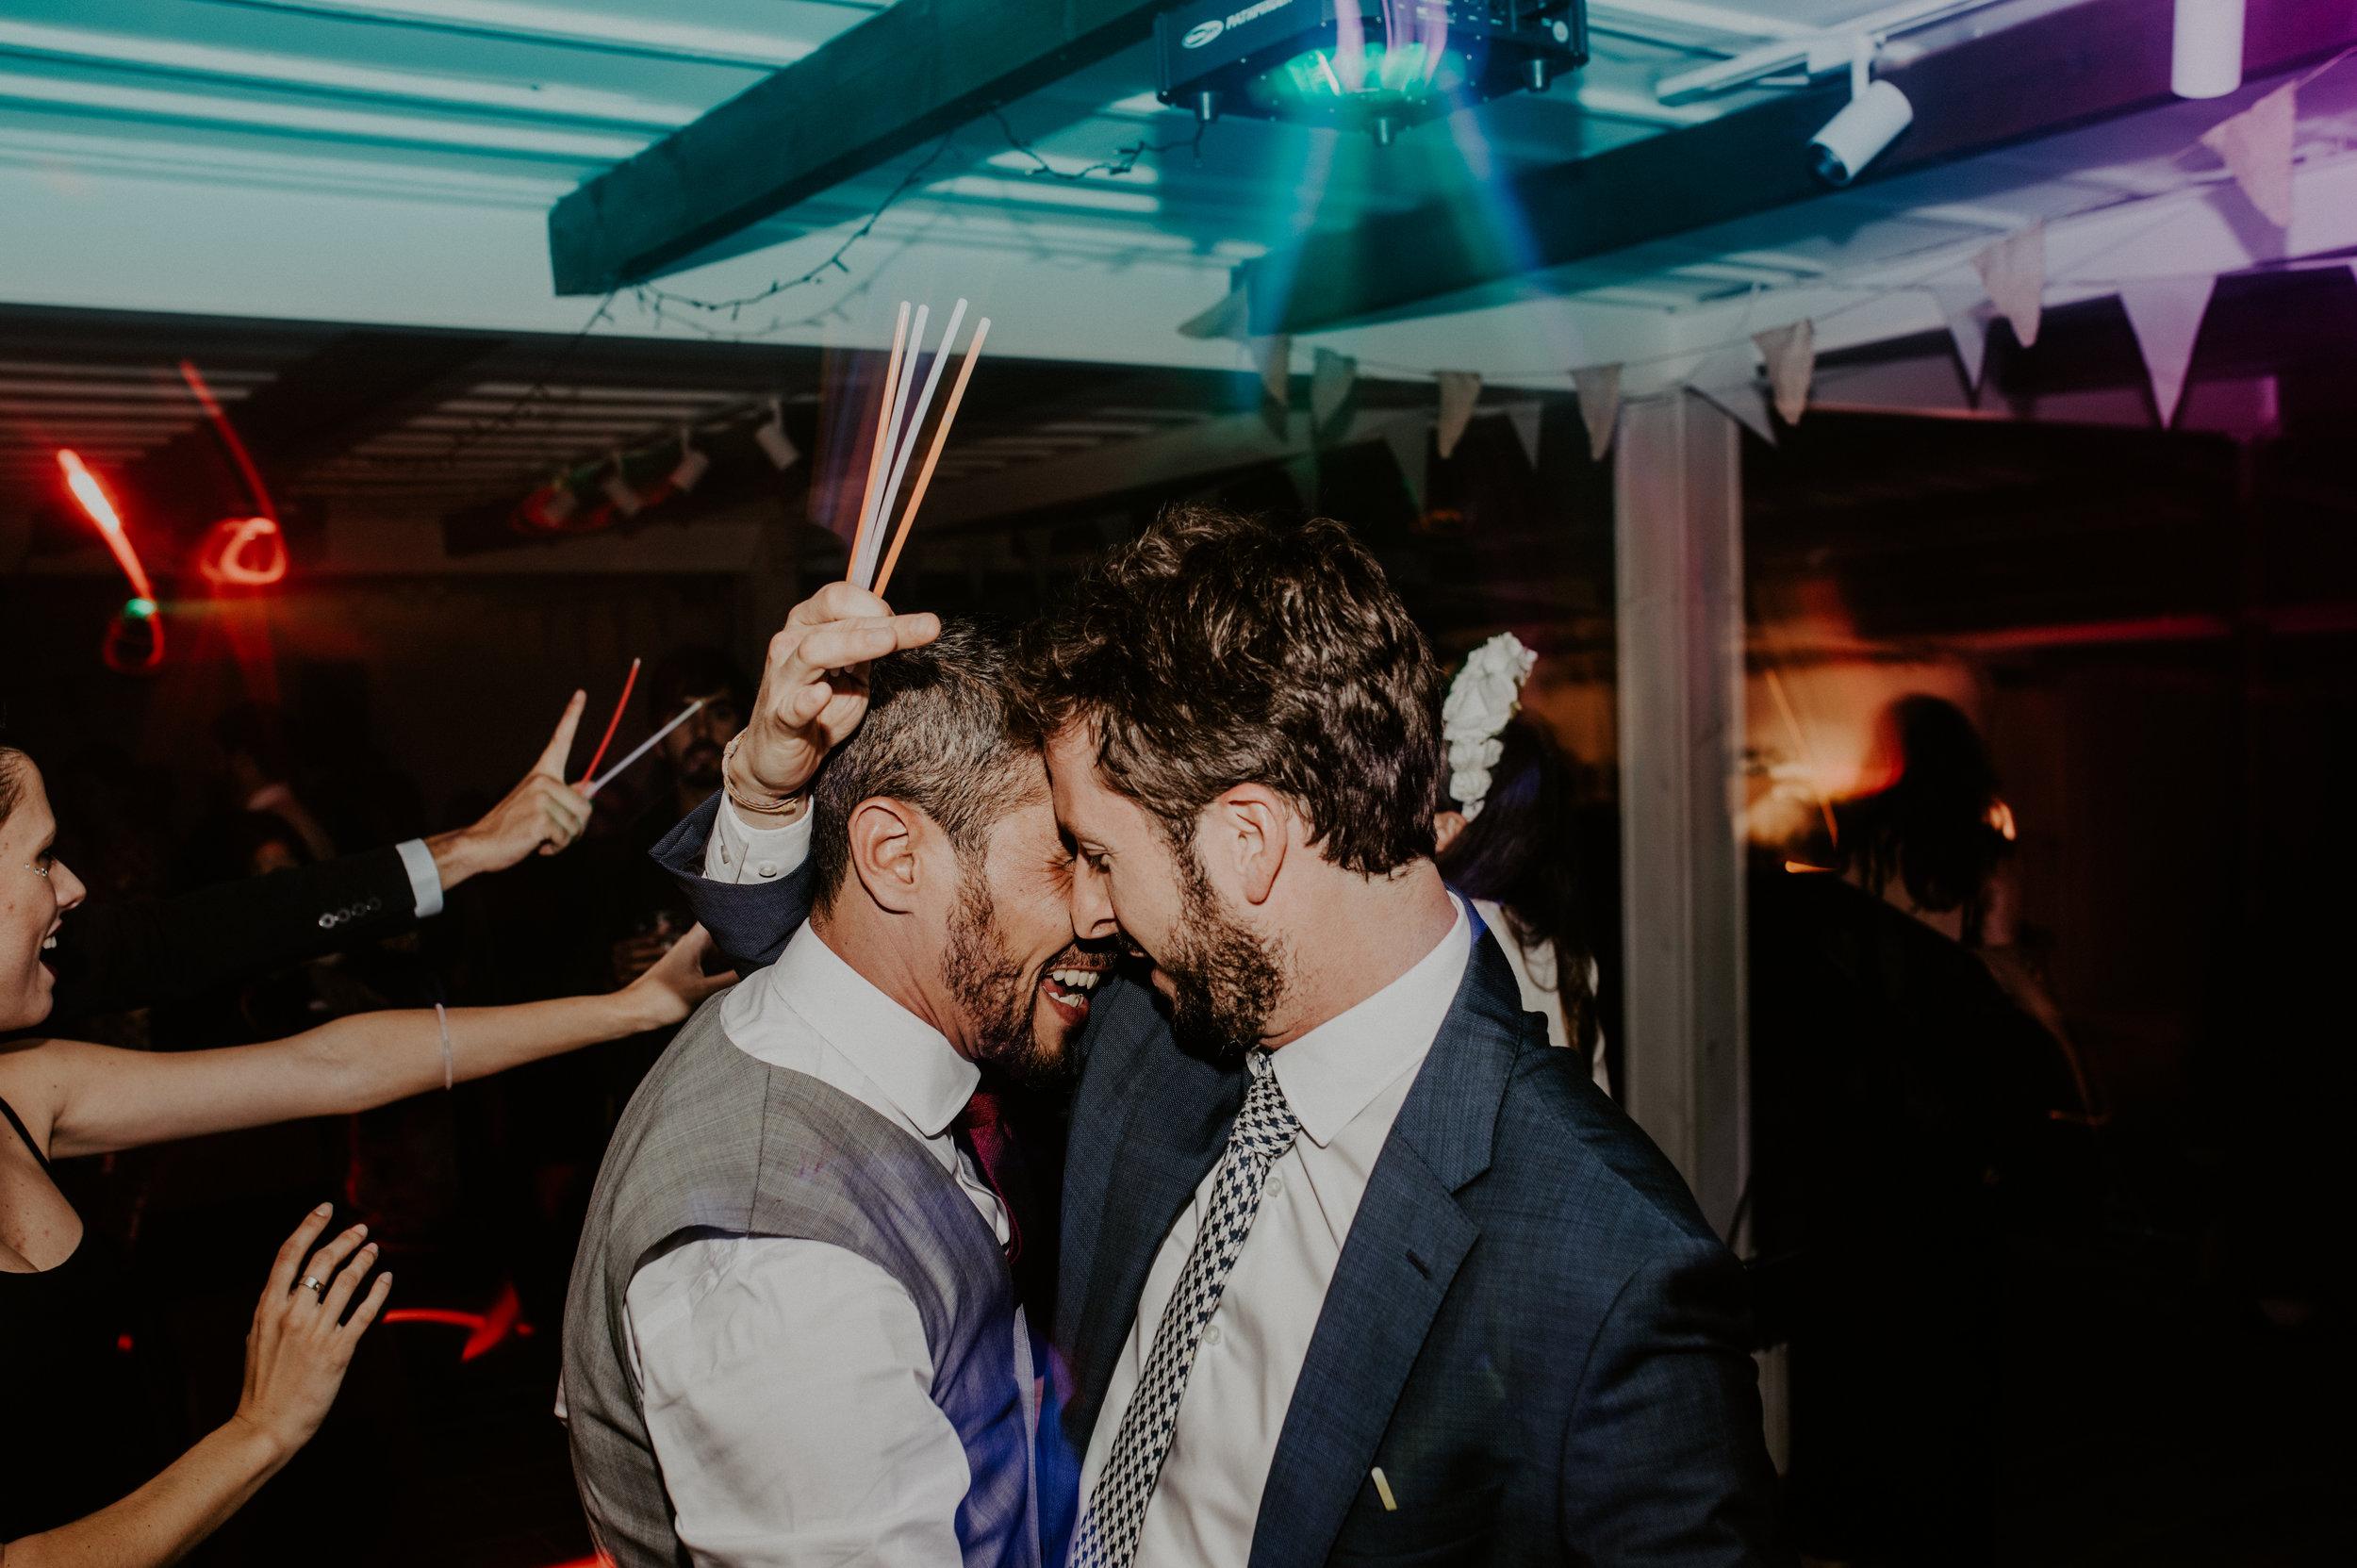 thenortherngirlphotography-fotografa-de-bodas-barcelona_destinartion-wedding-photographer_wedding-photographer_moroccan-wedding_HADNANANTIGONA-1561.jpg